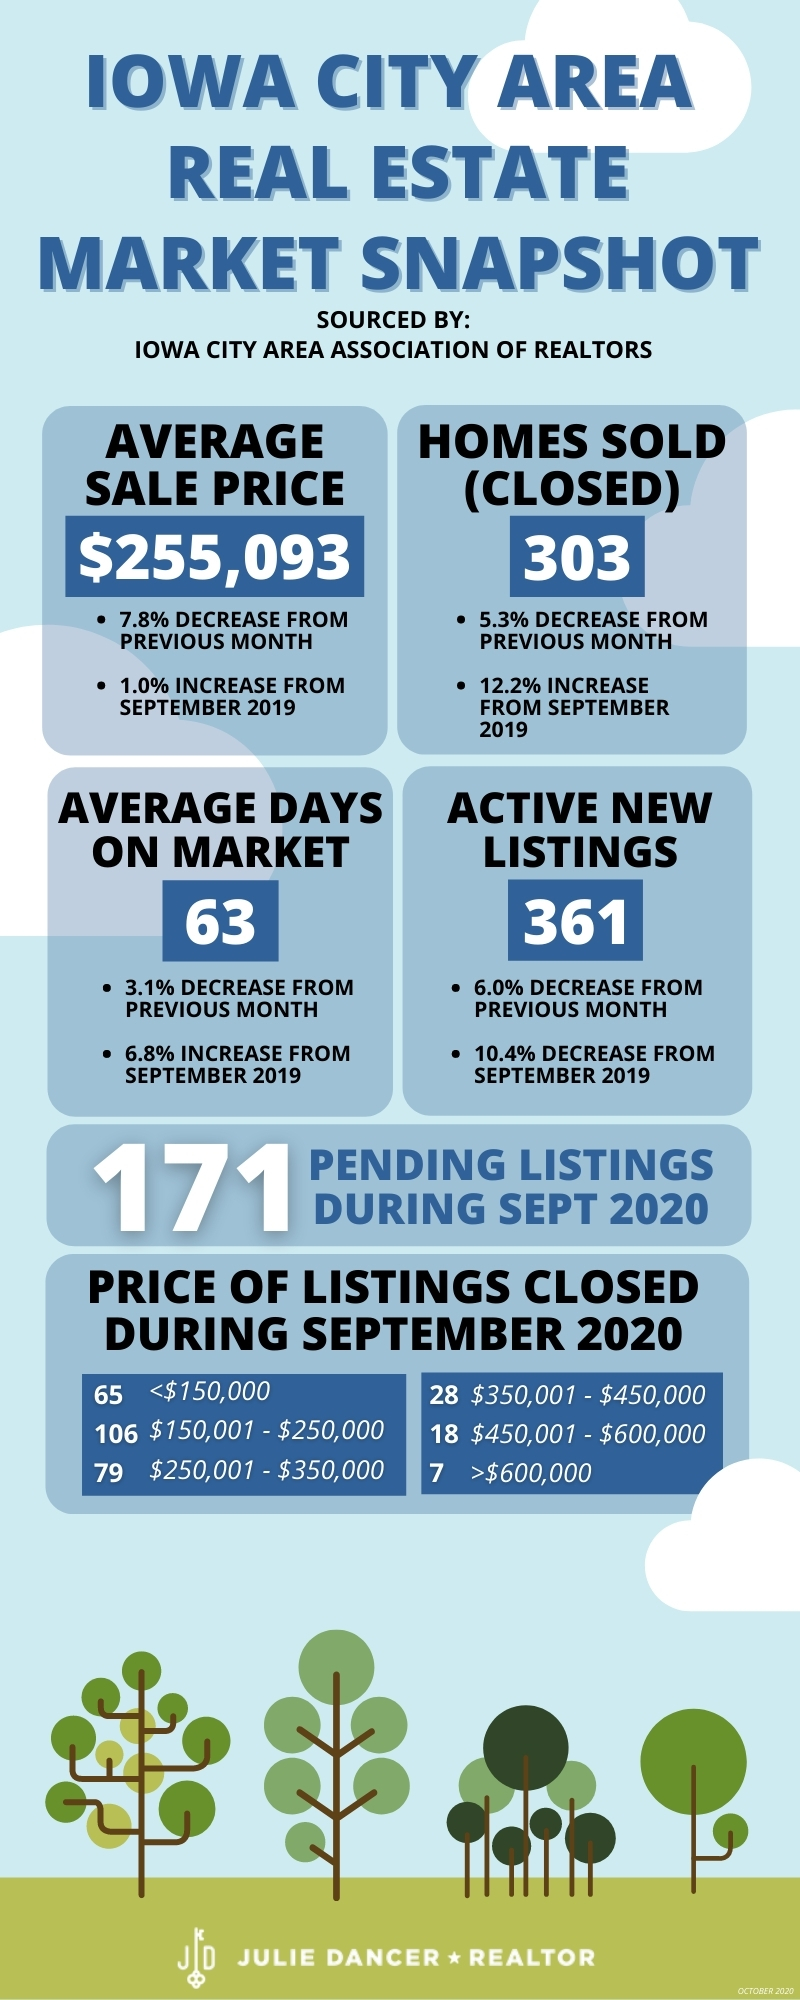 Real Estate Market Snapshot Infographic